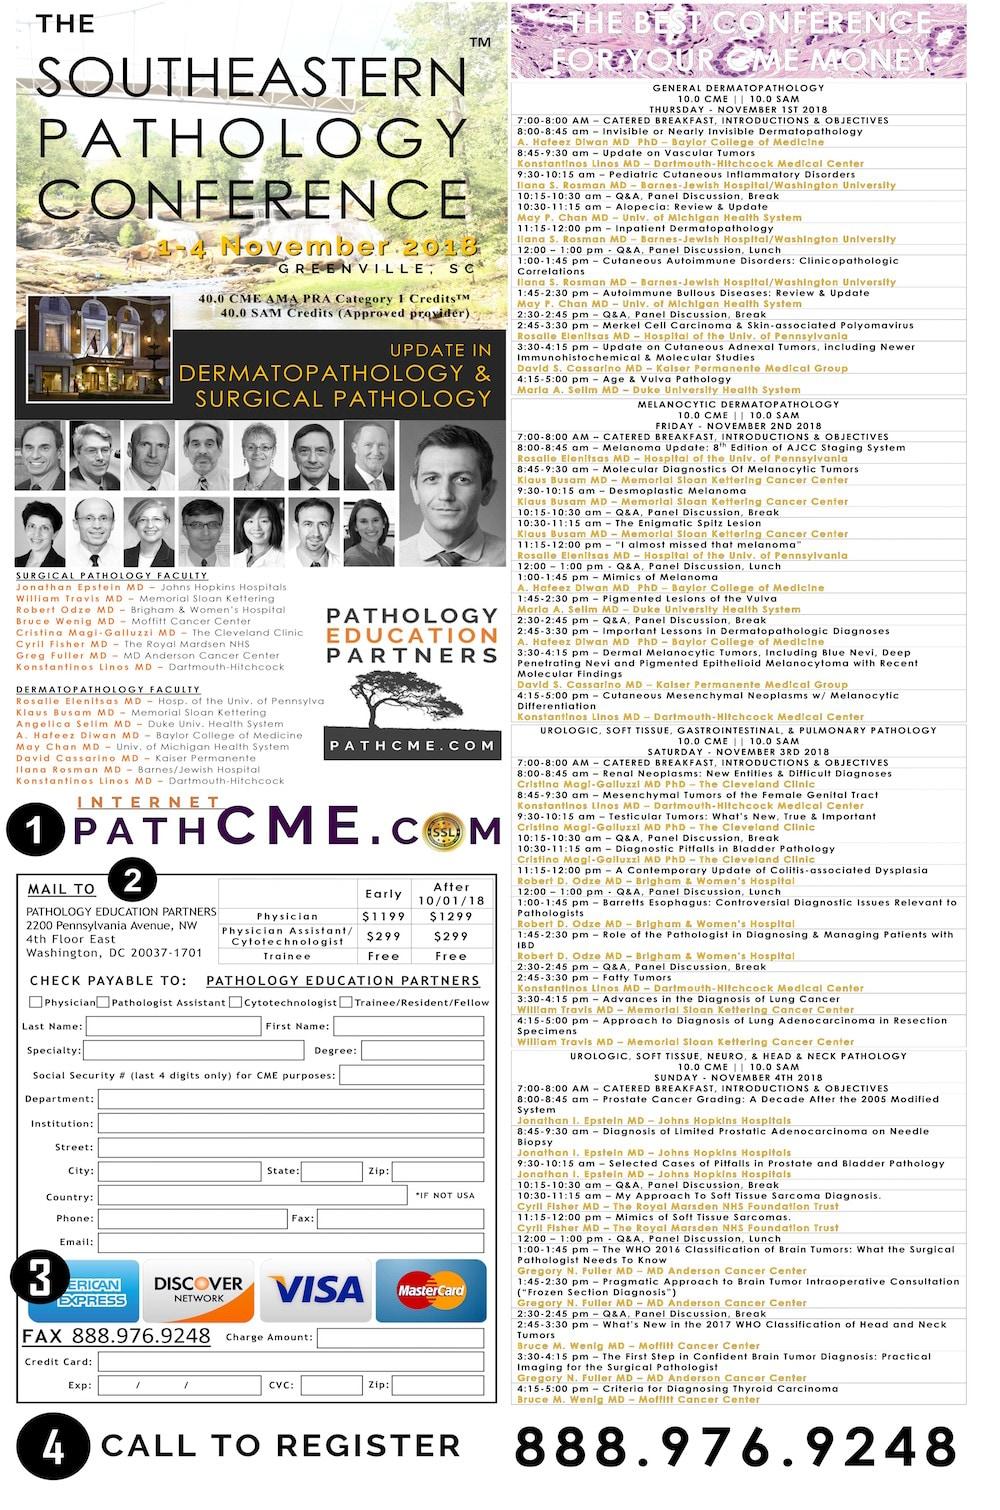 Pathology Outlines - Conferences / Webinars as of November 1